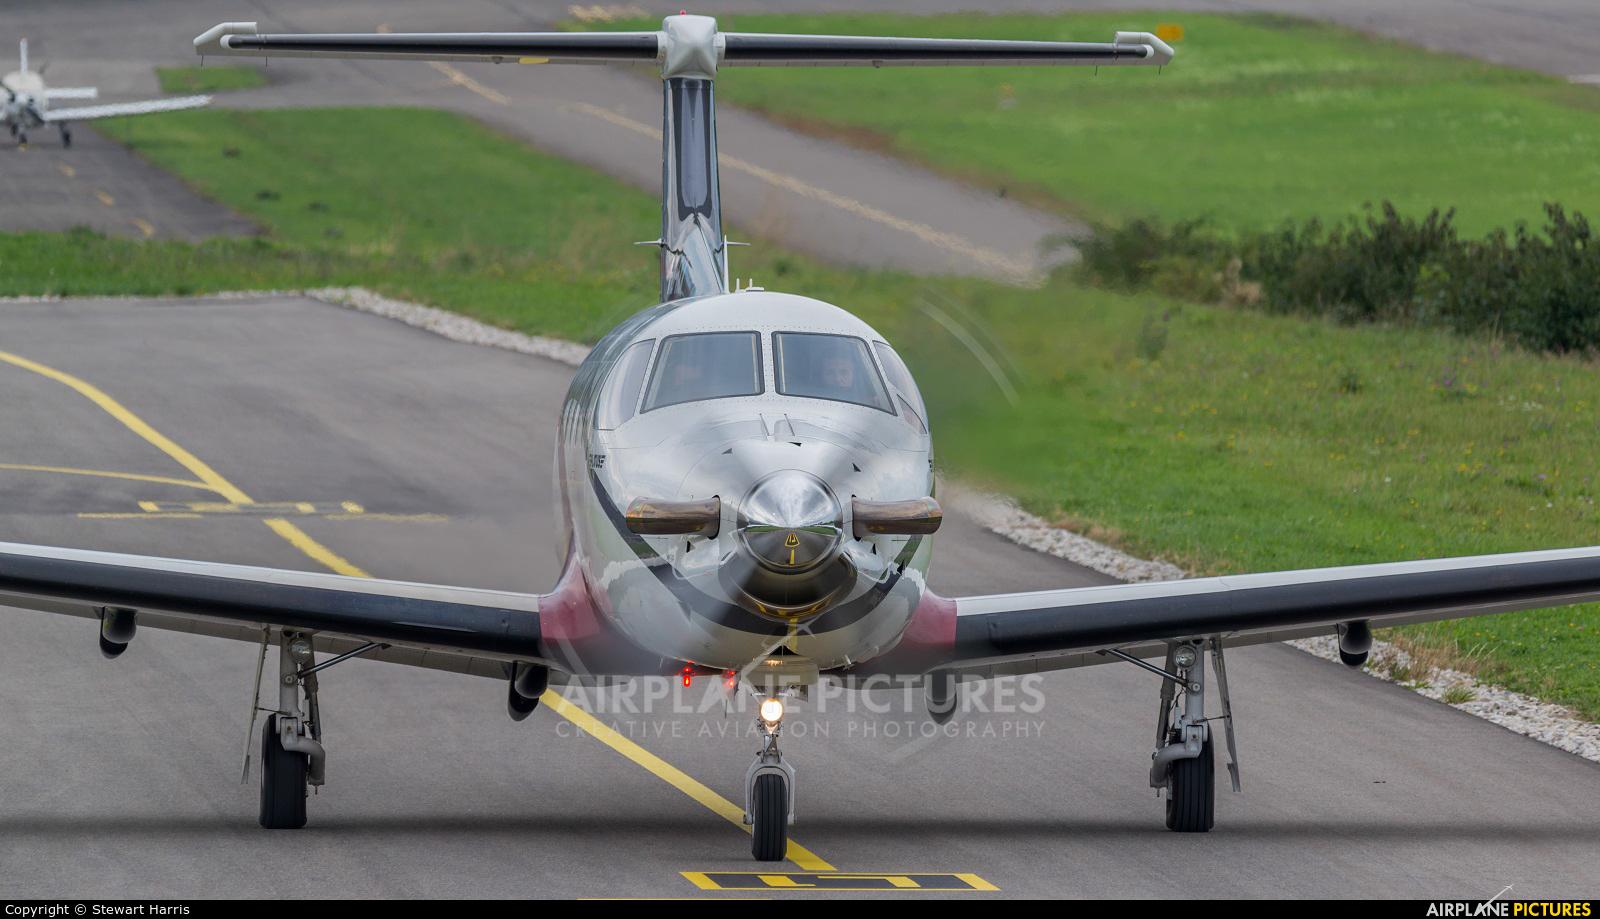 FLY 7 Executive Aviation SA HB-FXX aircraft at Lausanne - La Blécherette